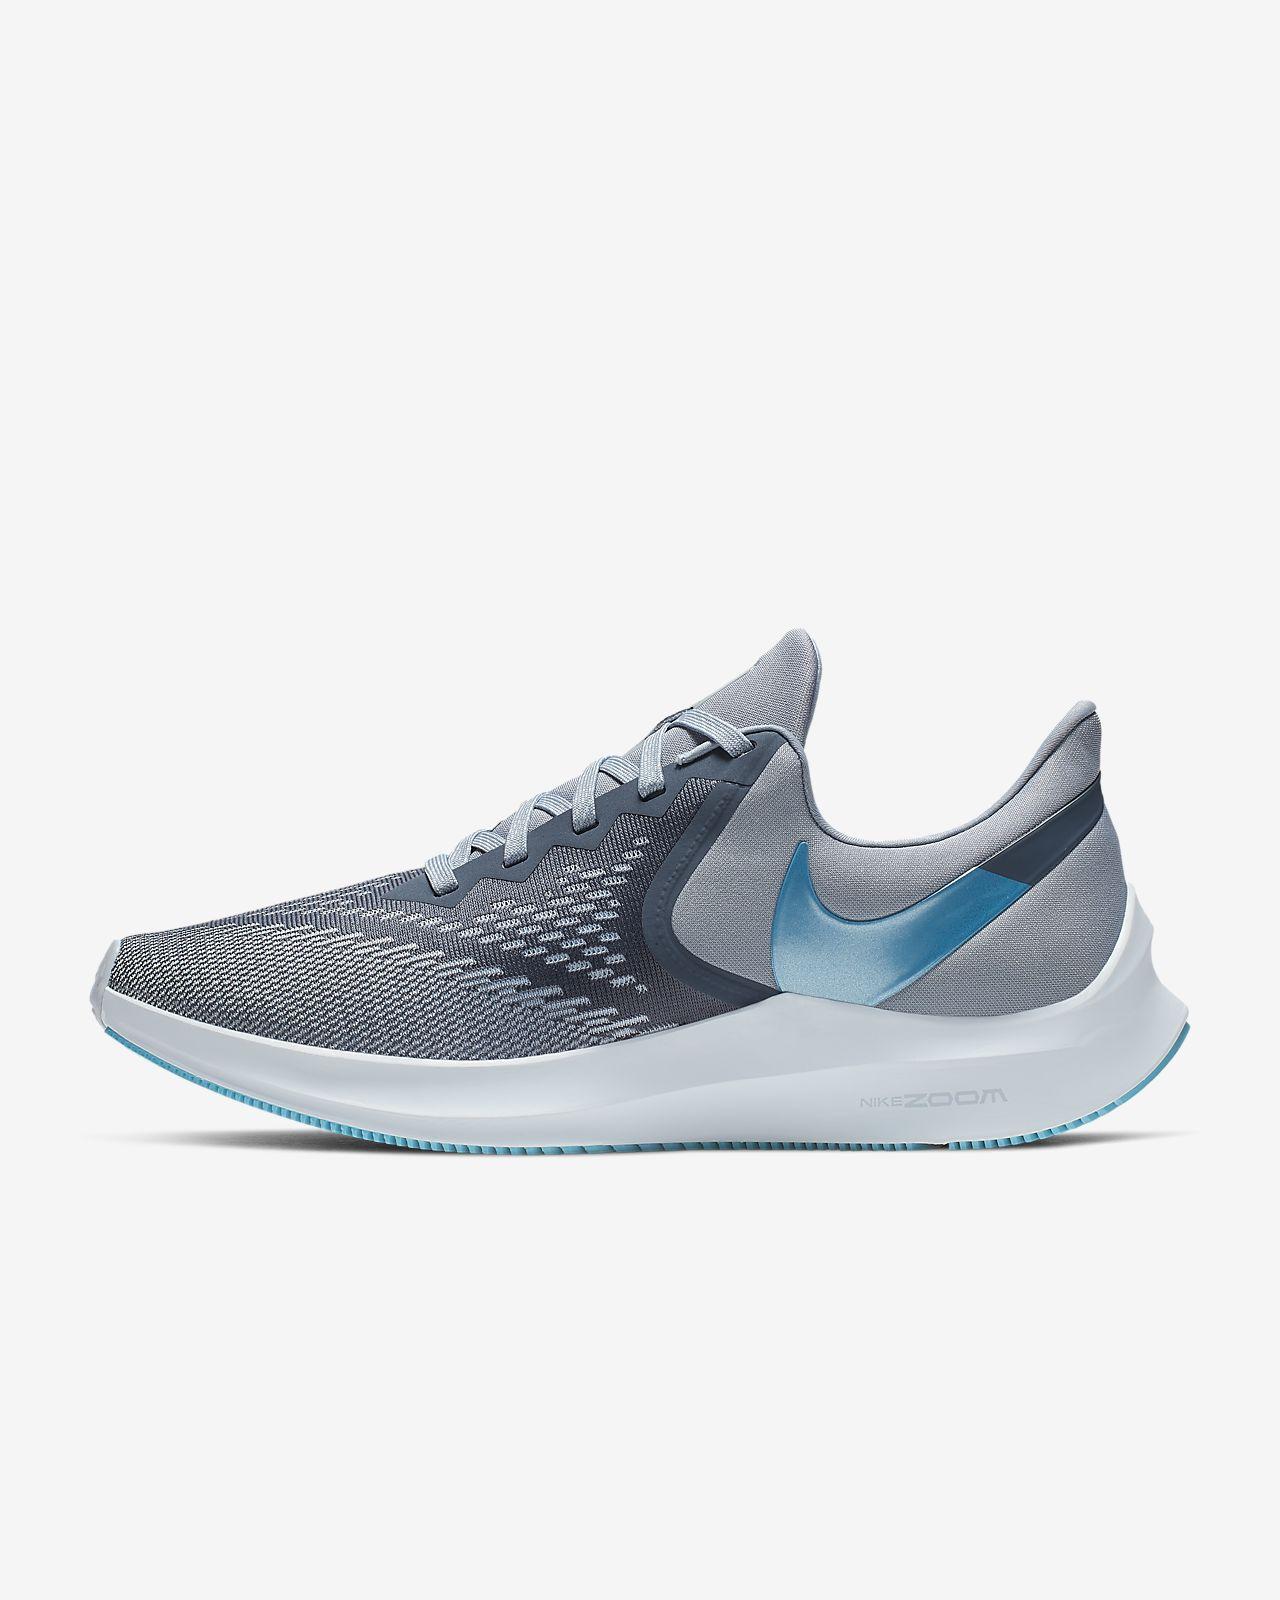 Nike Zoom Winflo 6 男子跑步鞋